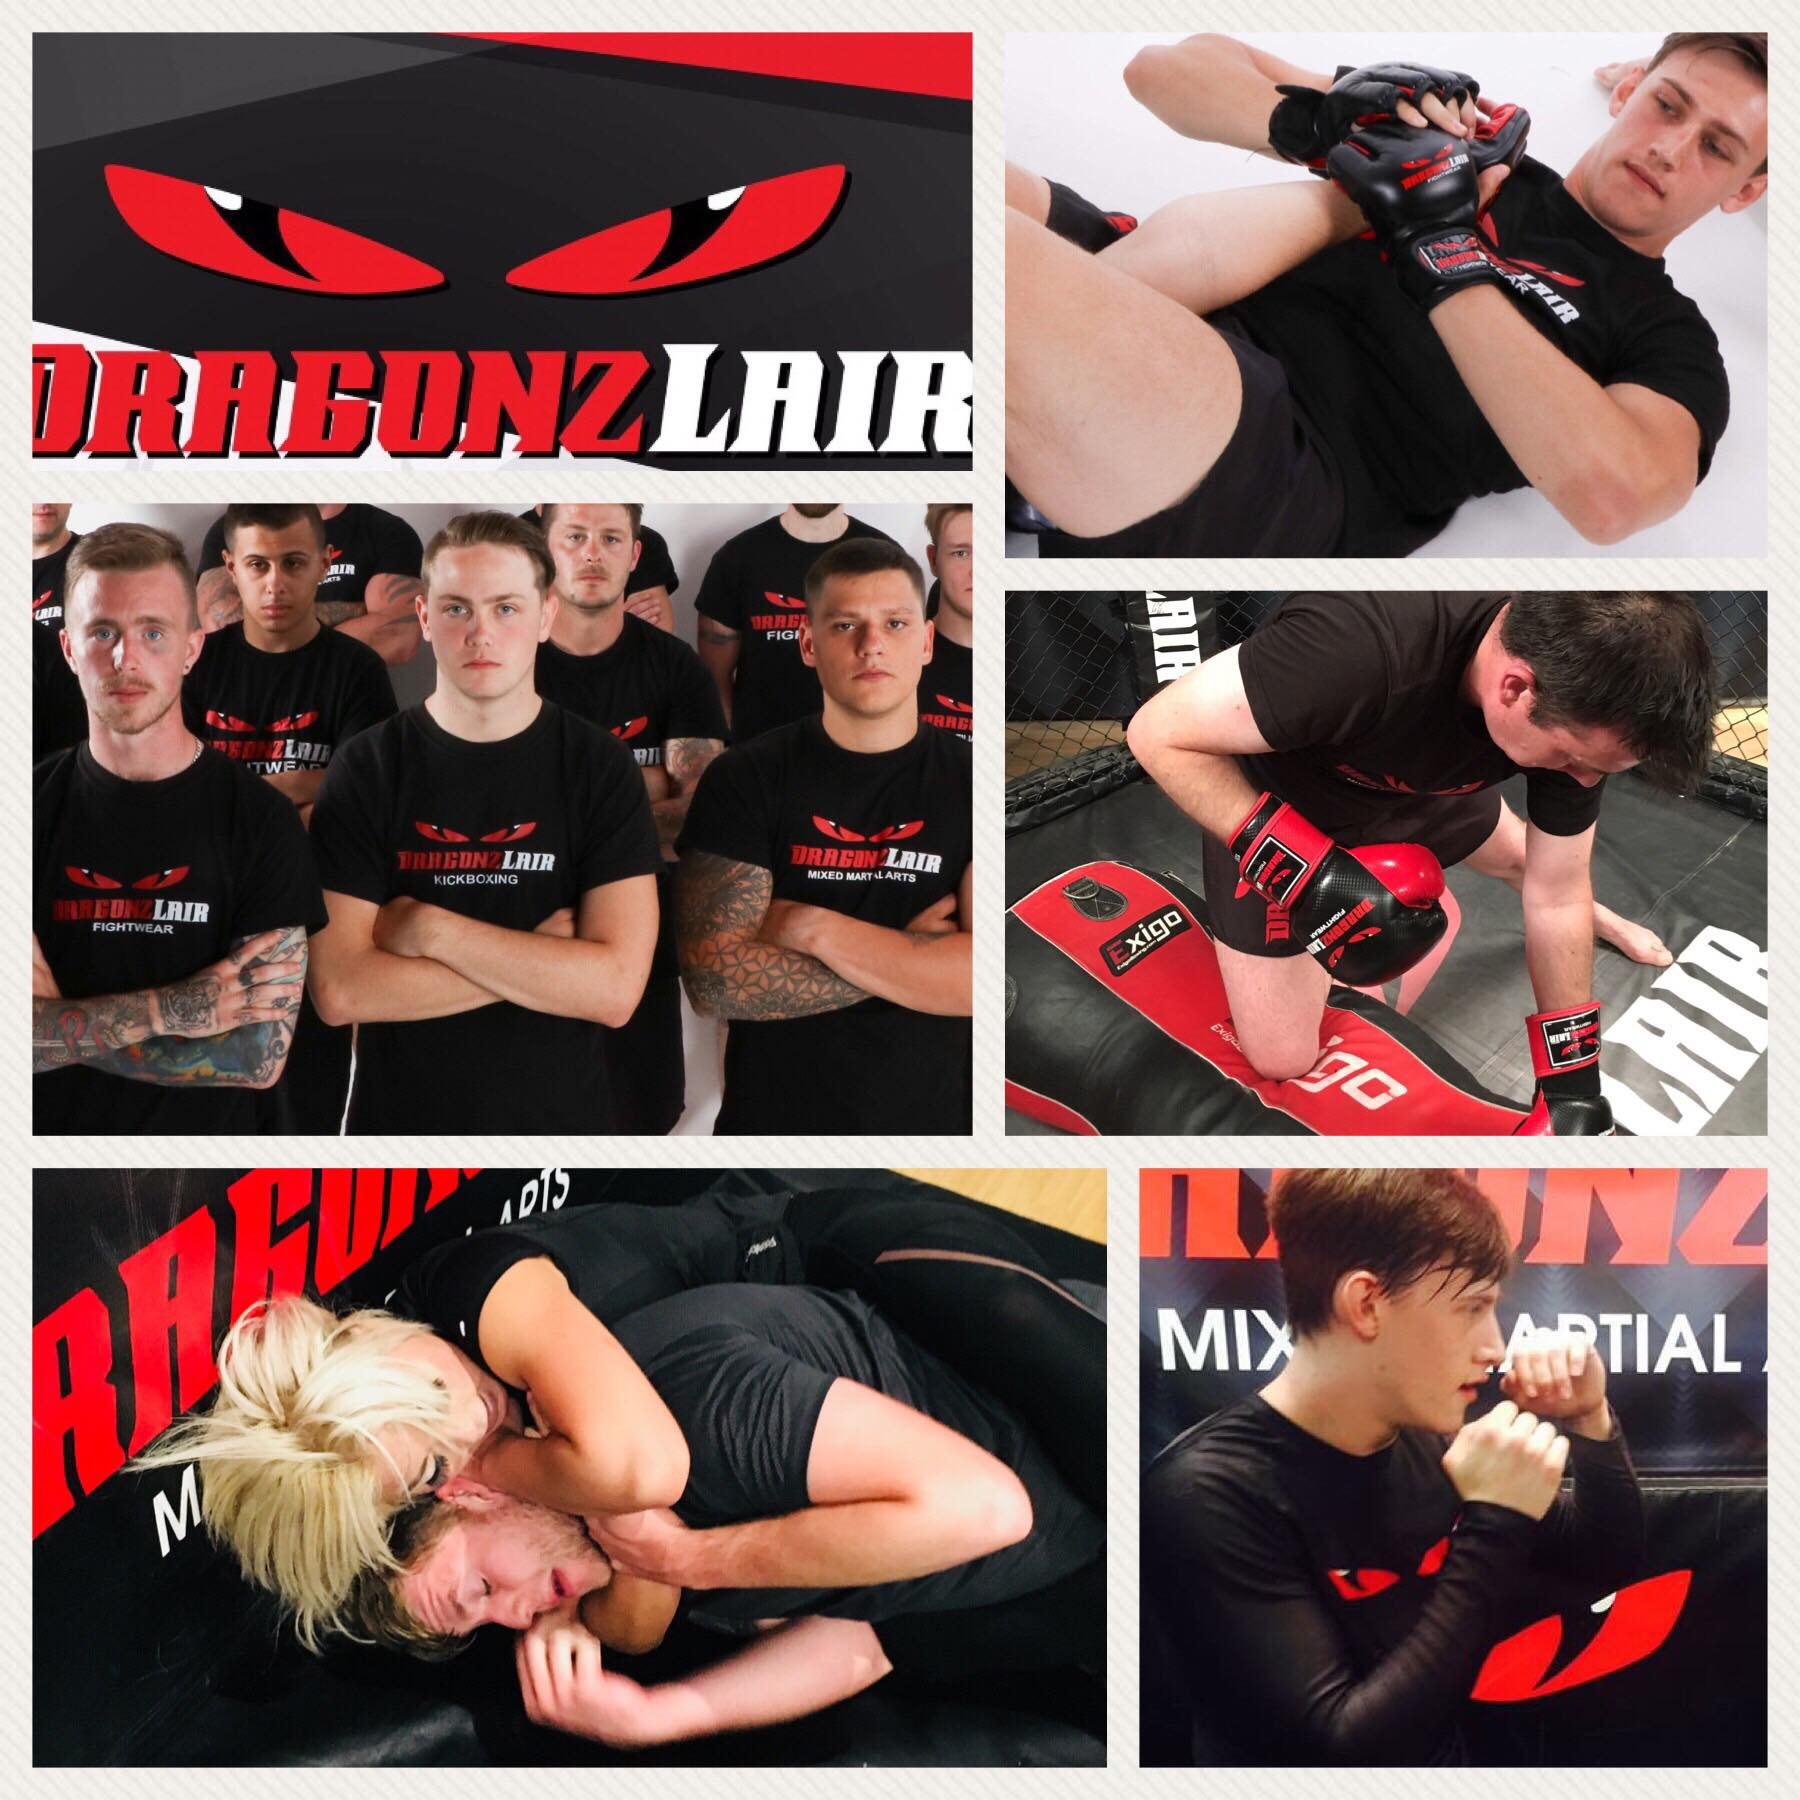 Dragonz Lair Gym Sittingbourne MMA Martial Arts Kickboxing